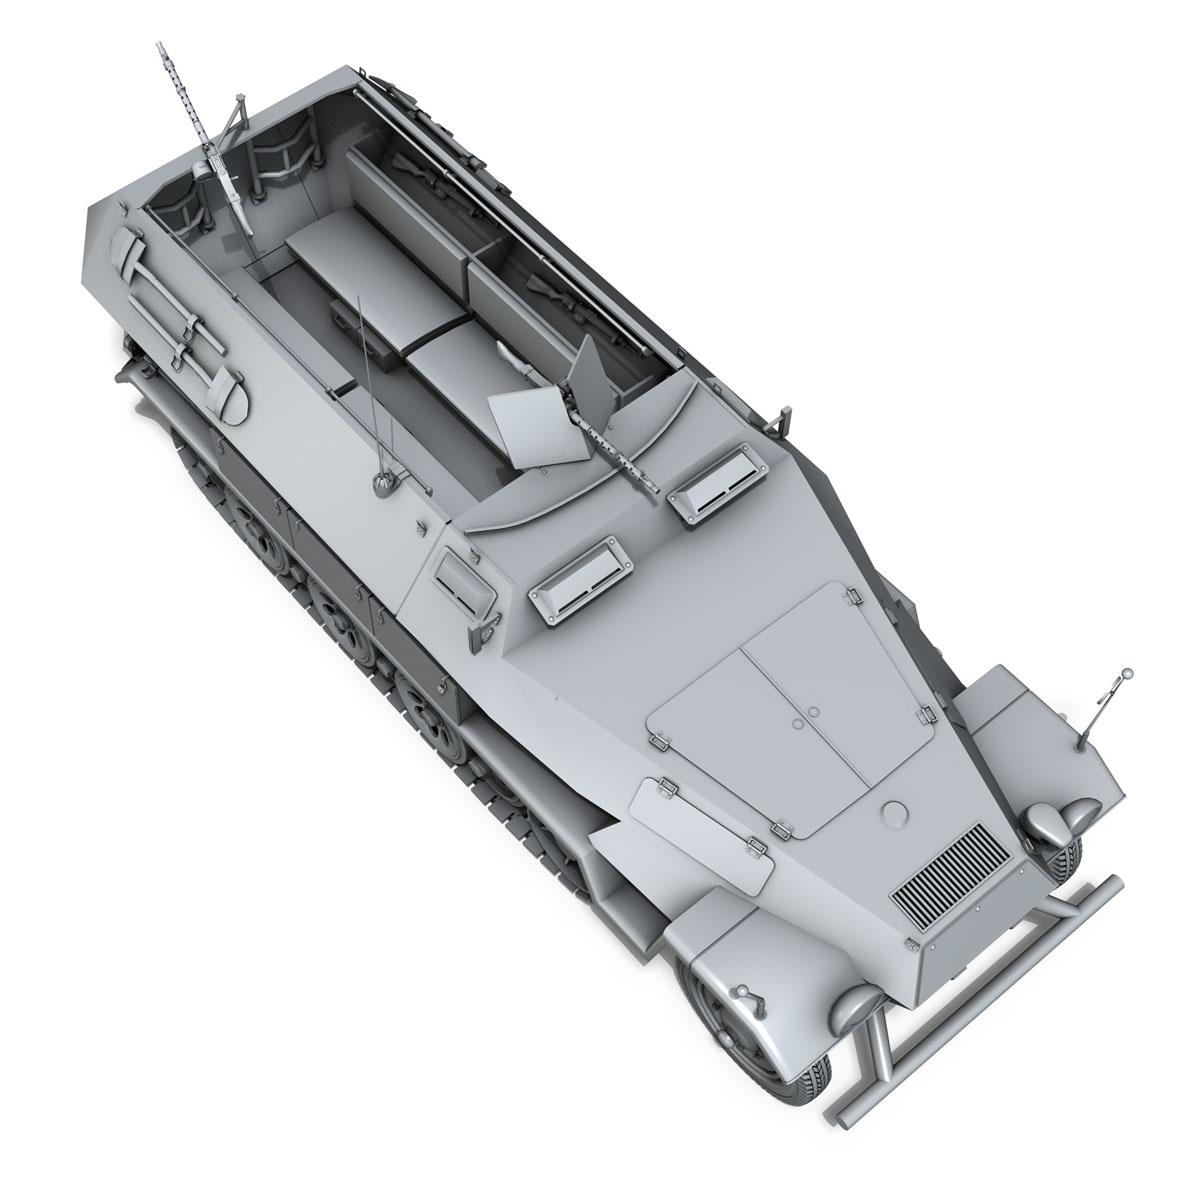 sd.kfz 251/1 ausf.b – hanomag halftruck 3d model 3ds fbx c4d lwo obj 151807